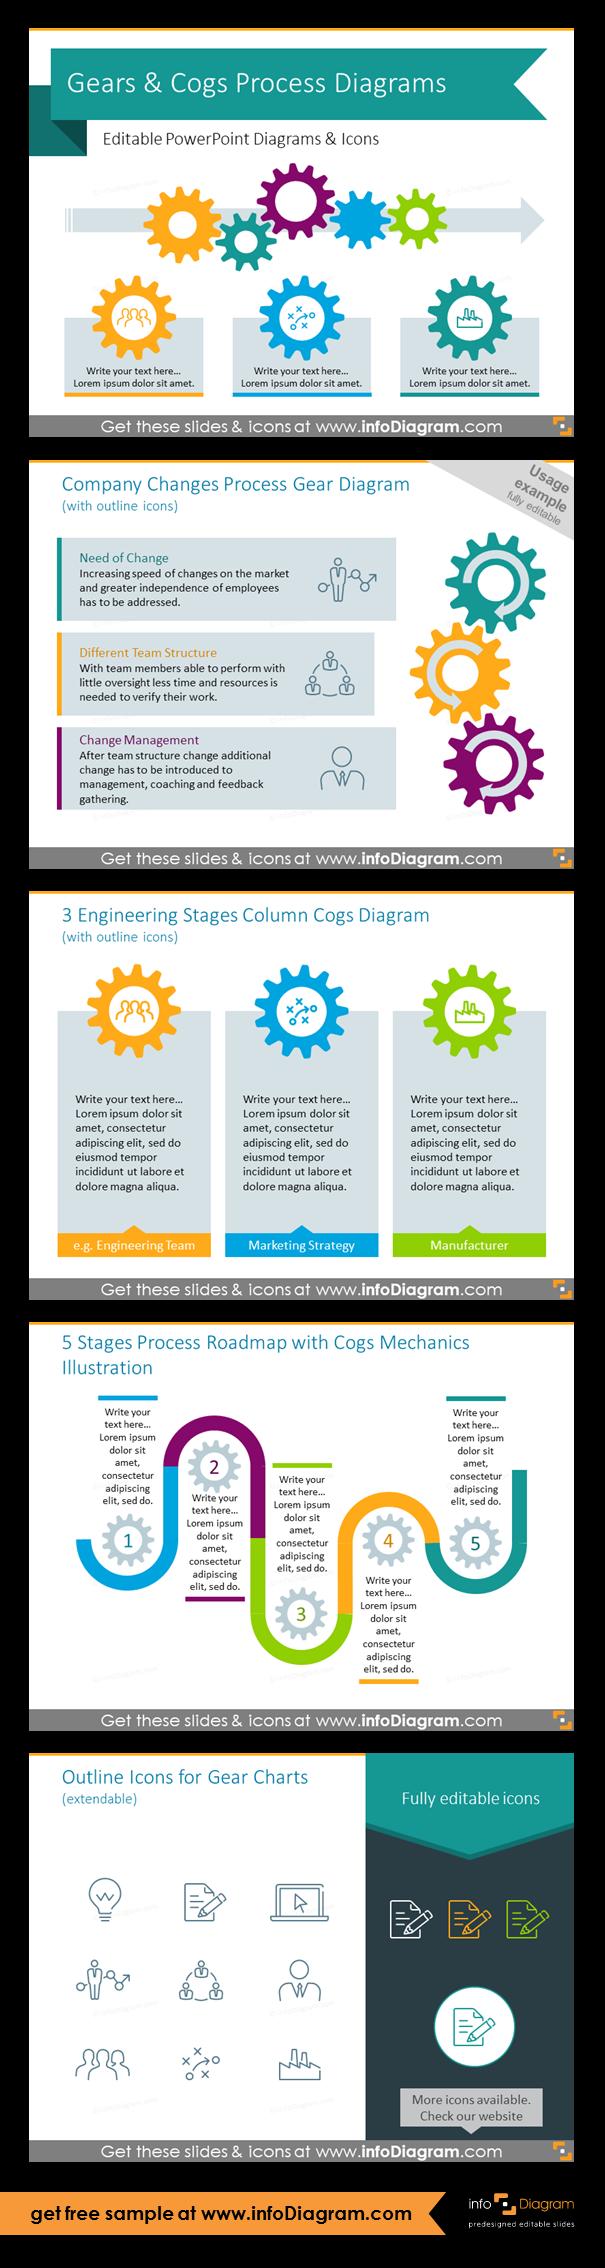 Resume Template Power Point Template Web Design Instagram Ideas Layout Ideas Desain Powerpoint Presentasi Portofolio Desain Grafis